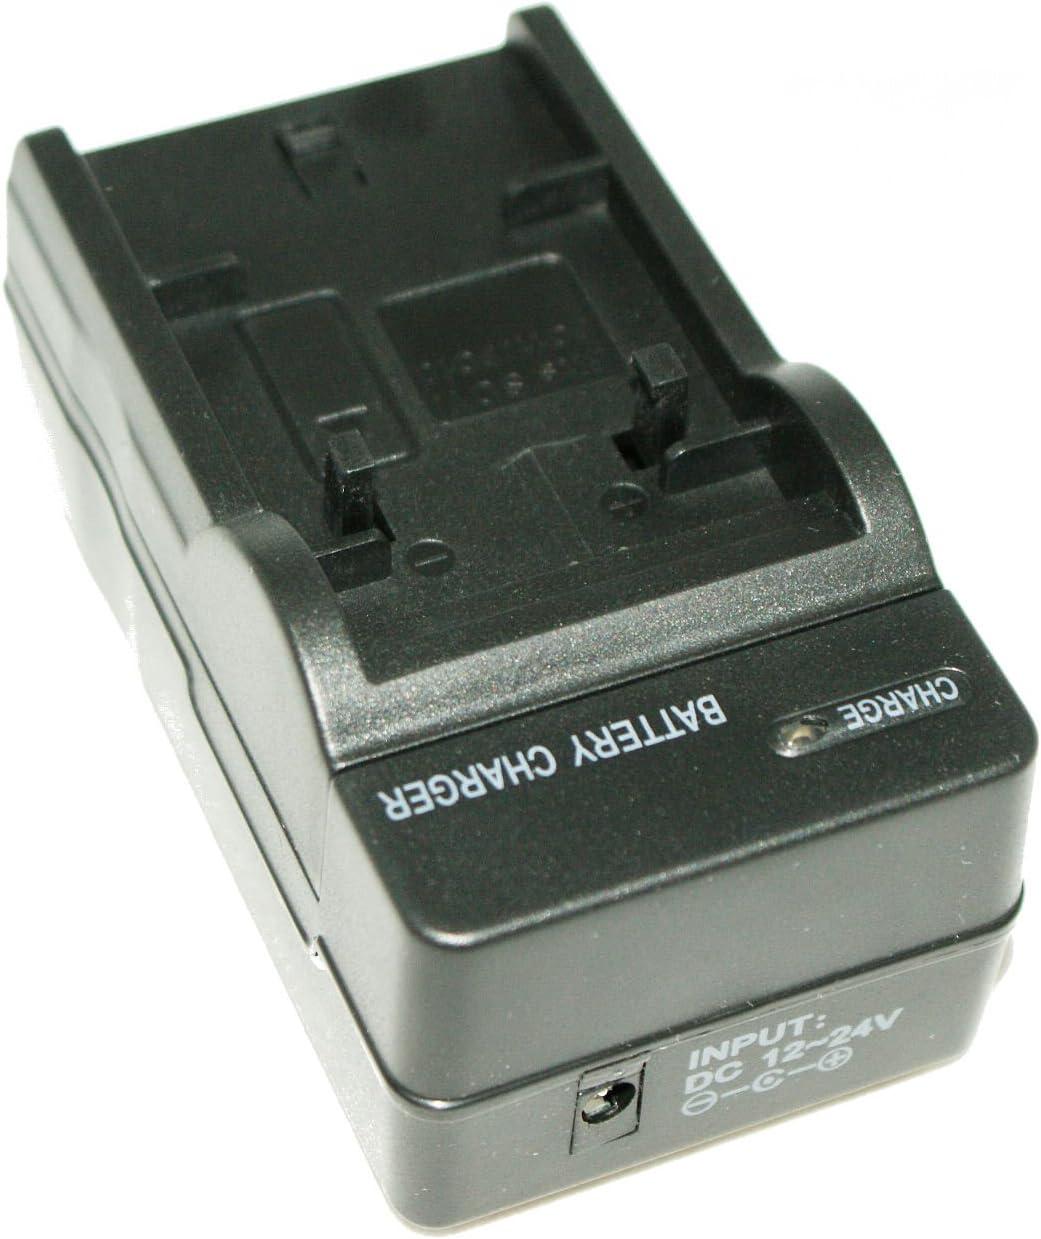 USA DMW-BCL7E Digital Camera Travel Charger Ex-Pro/® Panasonic VW-BCK7 VWBCK7 DMC-SZ9 DMC-FS50 DMC-XS3 for Lumix DMC-F5 DMC-XS1 DMC-FH50 UK Canada /& Europe DMC-SZ3 2 Hour Fast Charge